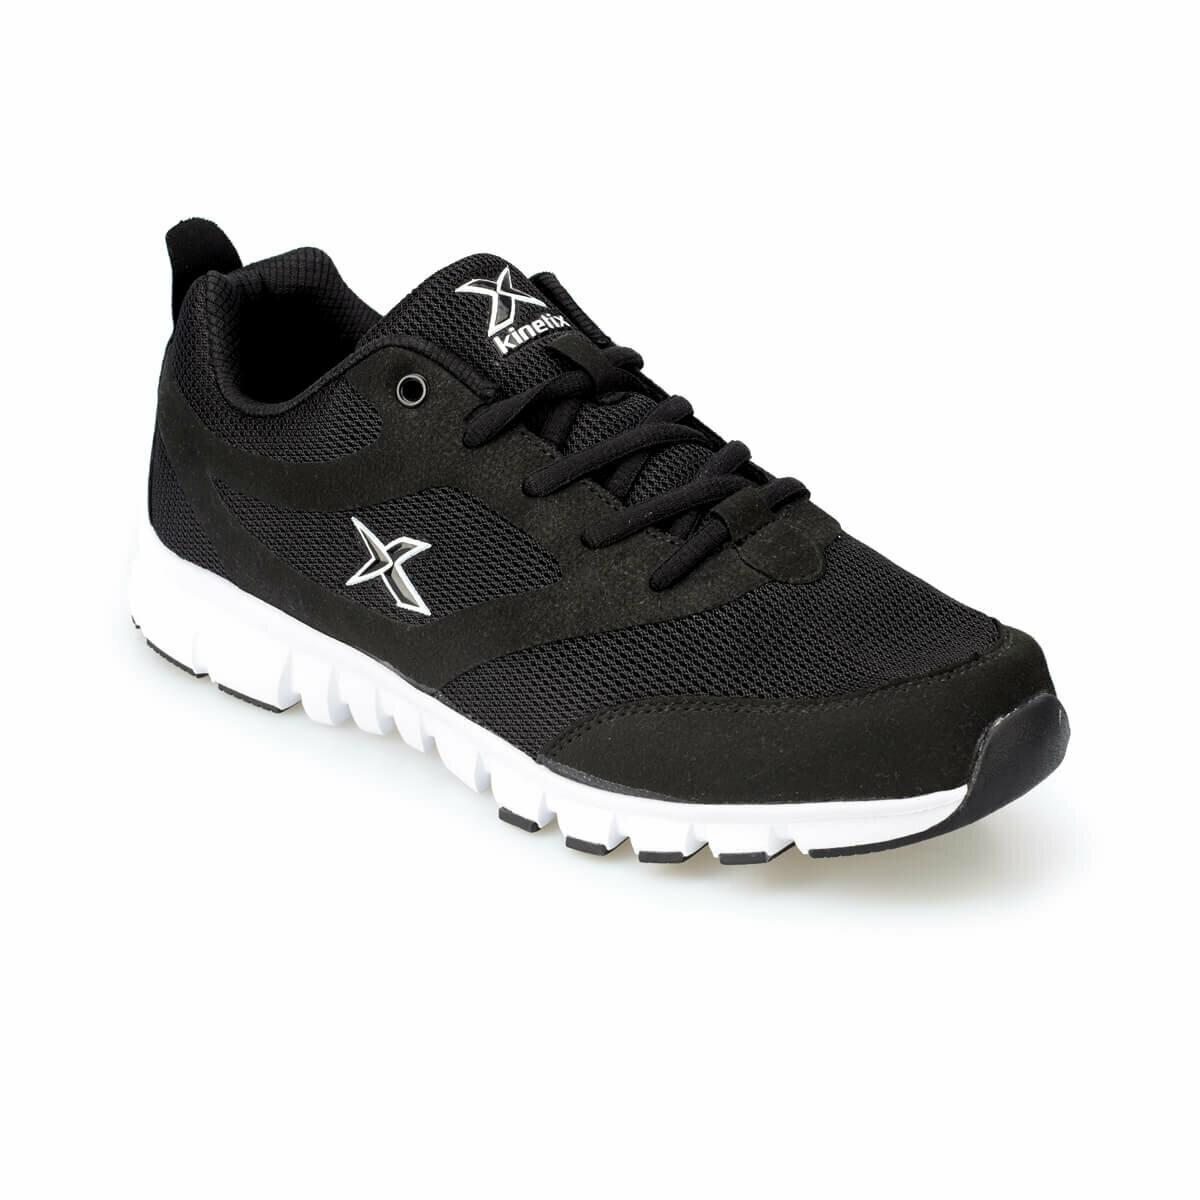 FLO Black Men Sneaker Shoes New Mesh Men Sneakers Casual Shoes Lac-up Men Shoes Lightweight Comforta